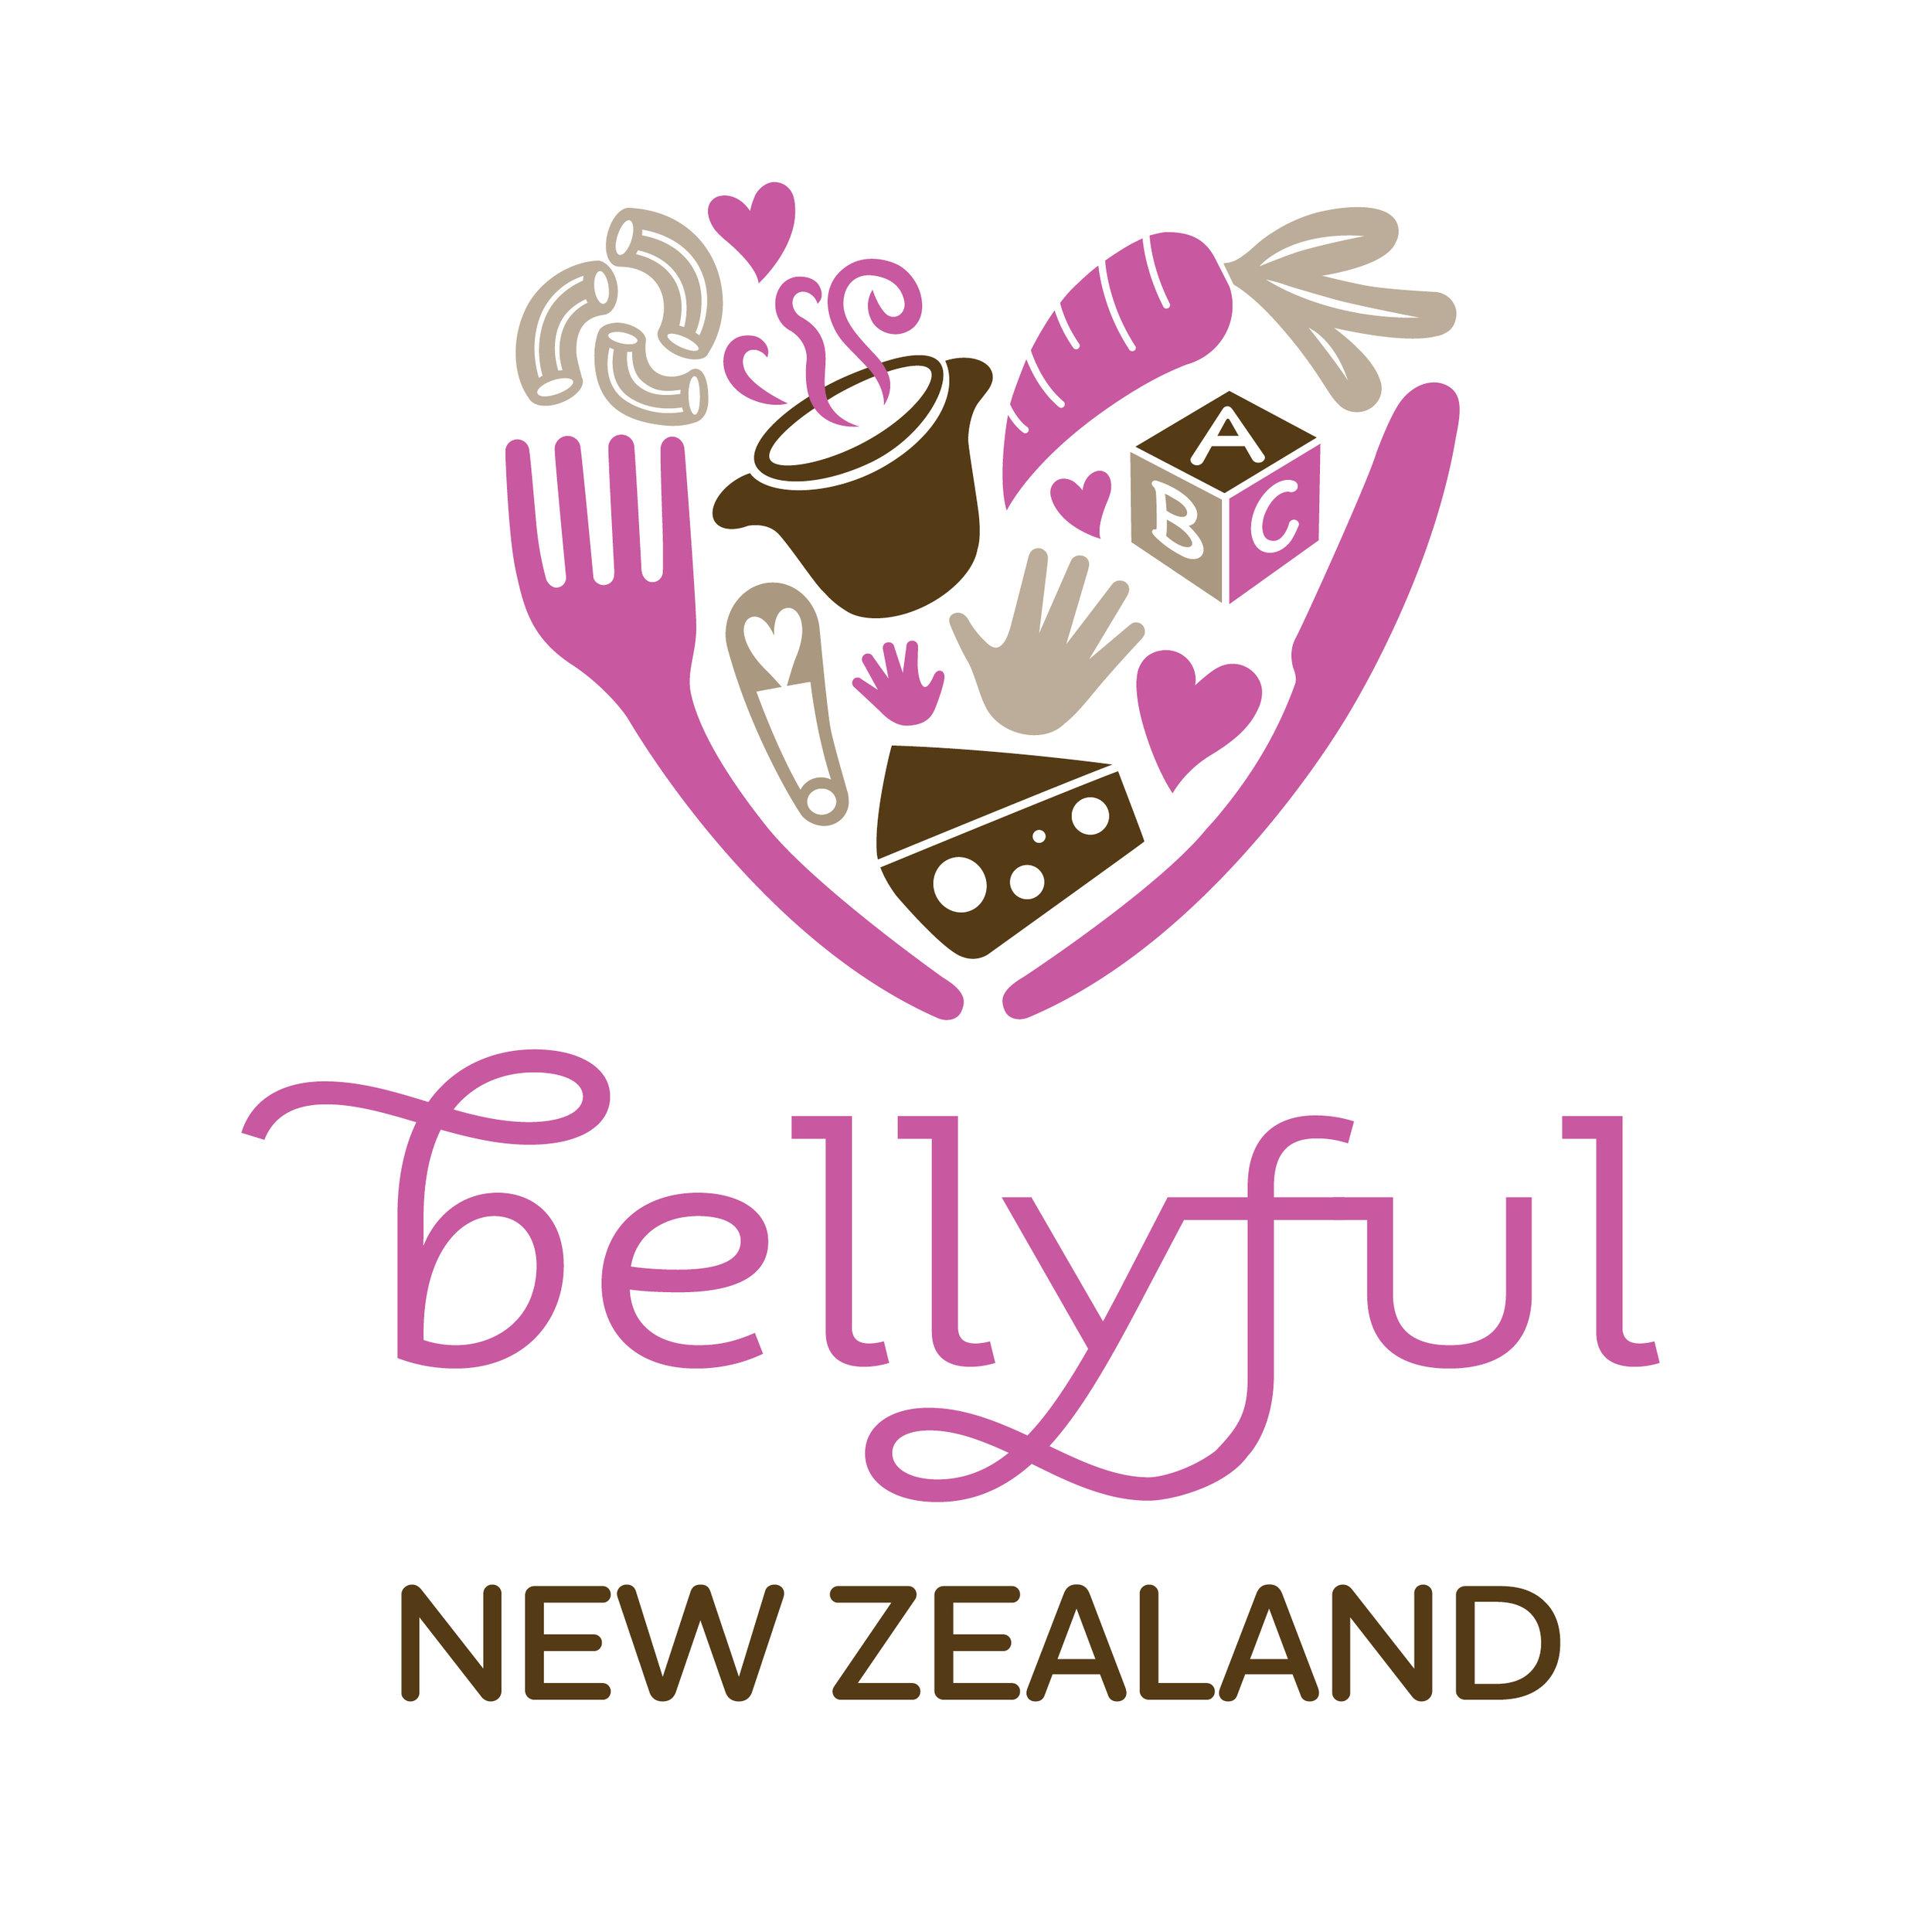 Bellyful logo transparent.jpg